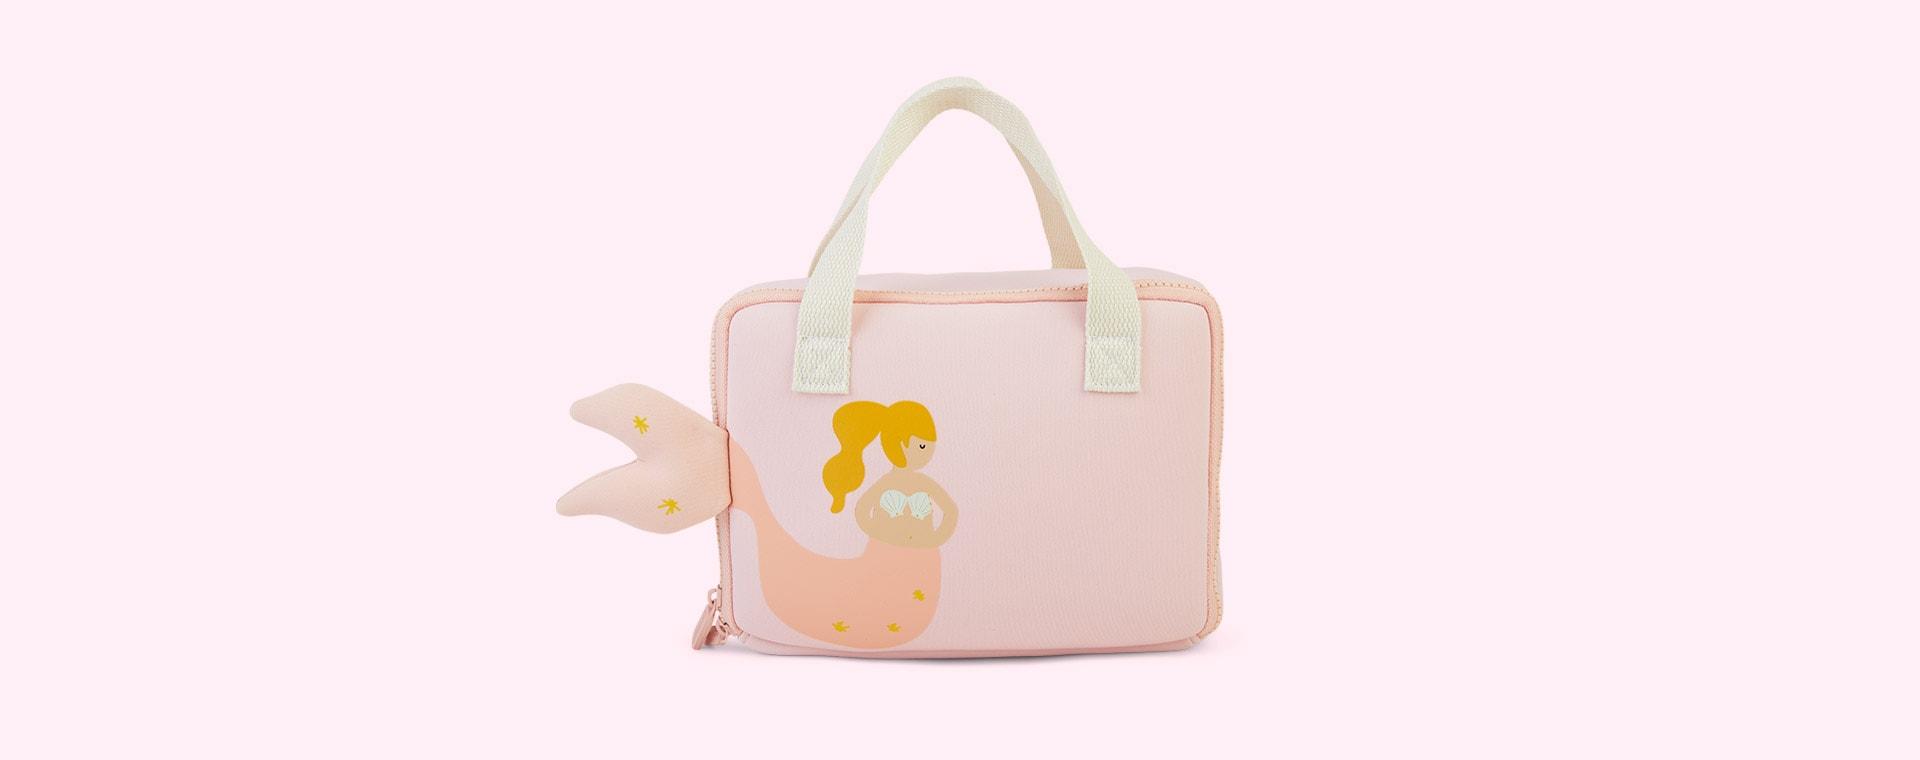 Mermaid Sunnylife Neoprene Lunch Bag